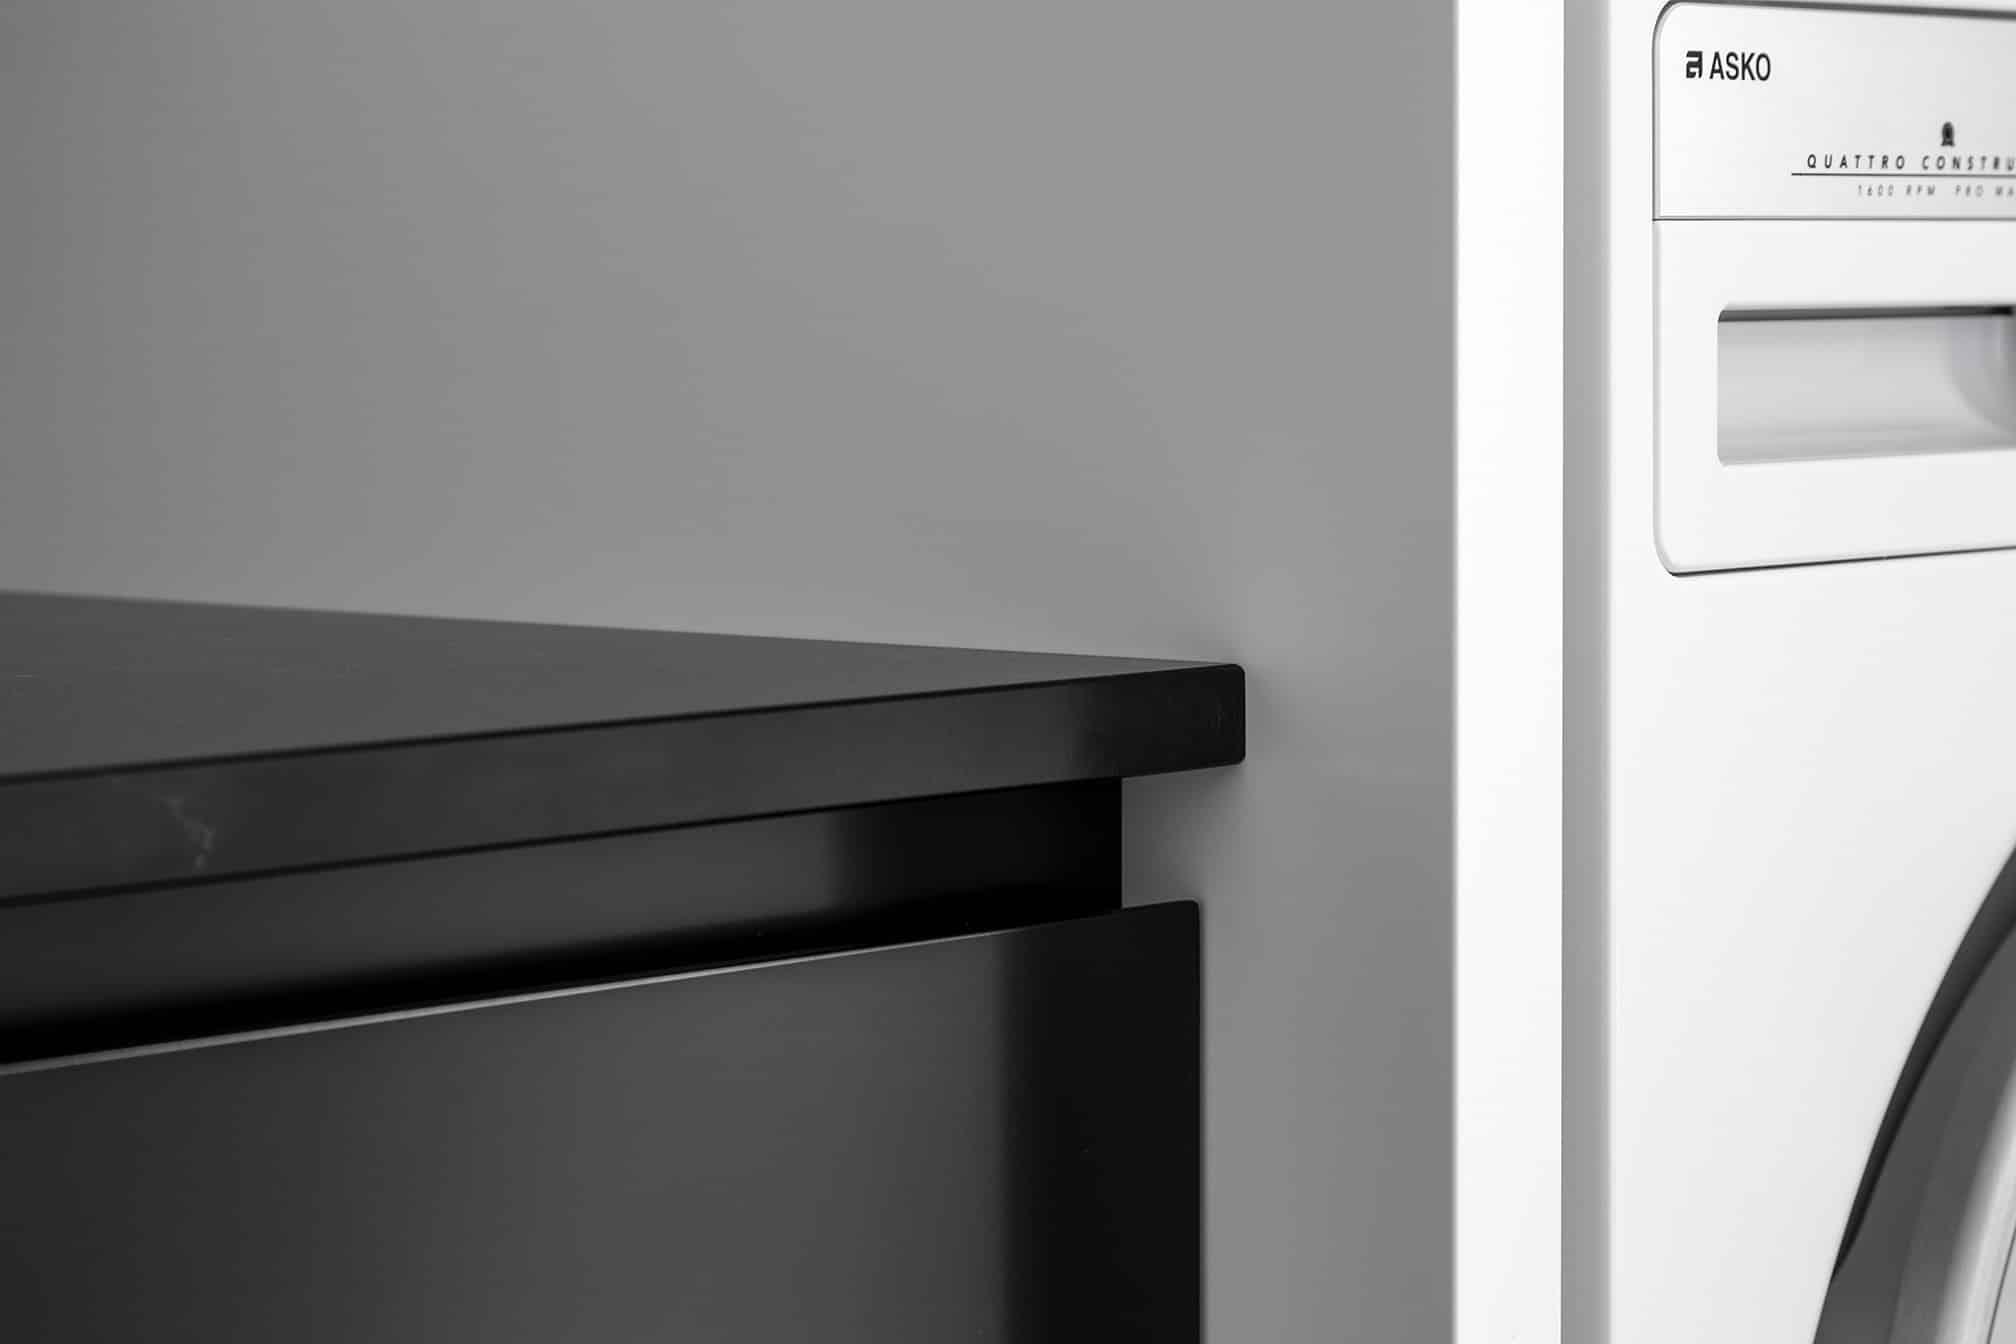 Monochrome Laundry cabinetry details